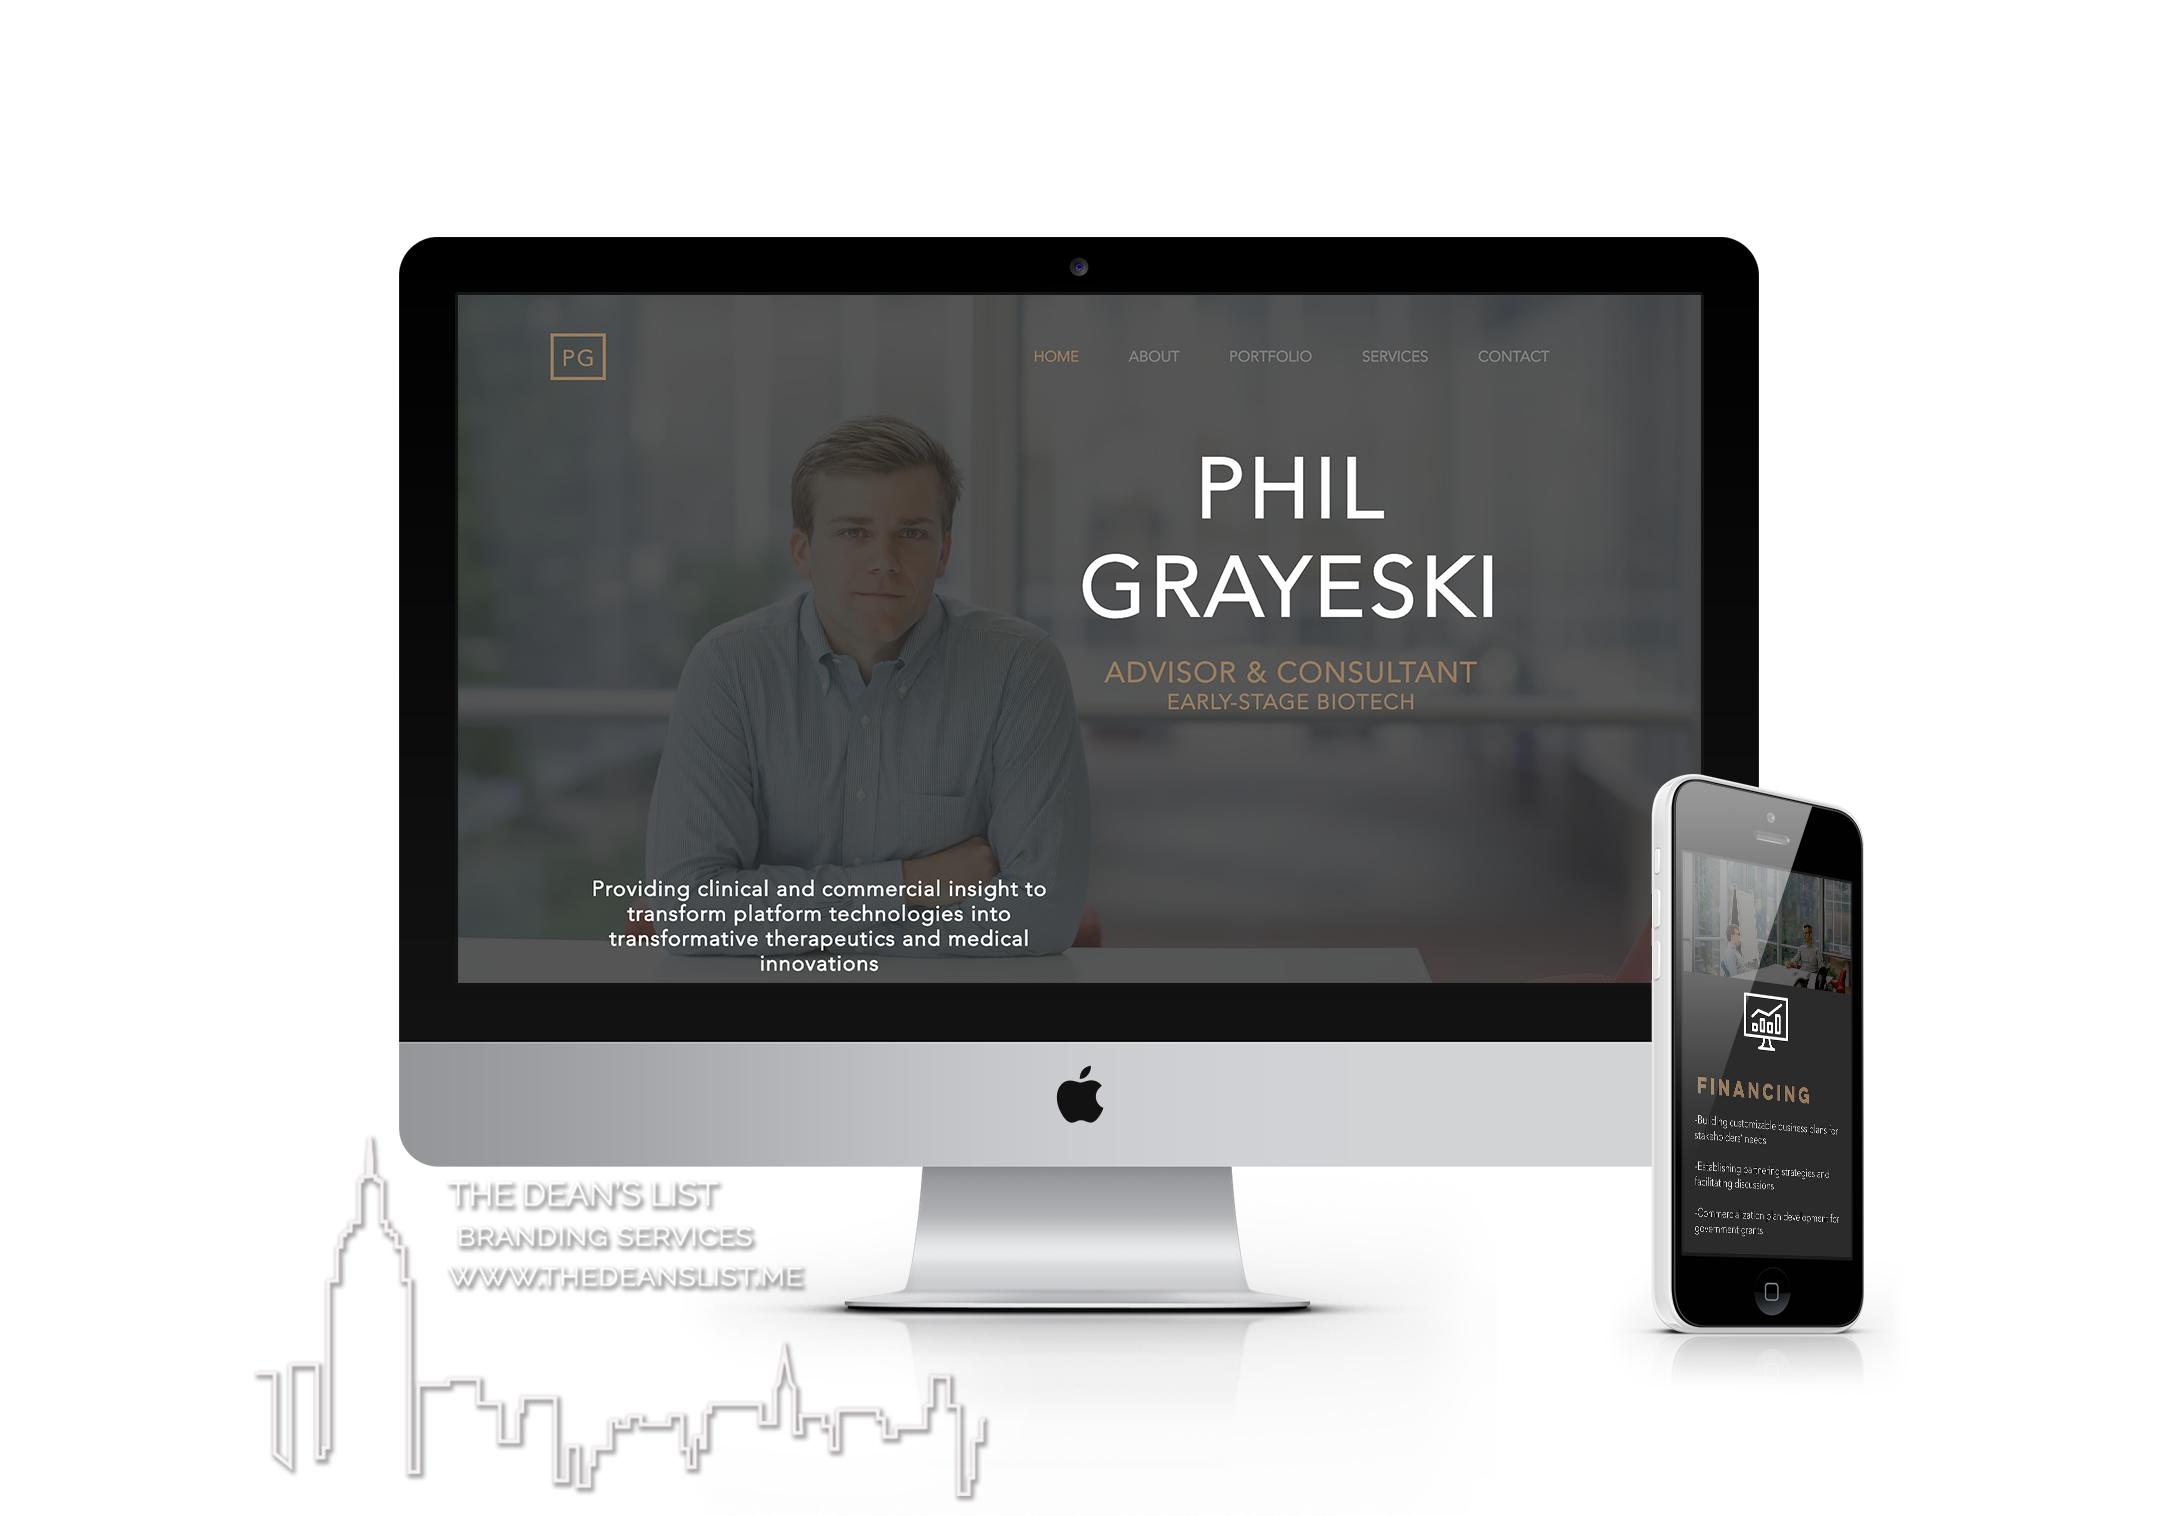 Phil Grayeski